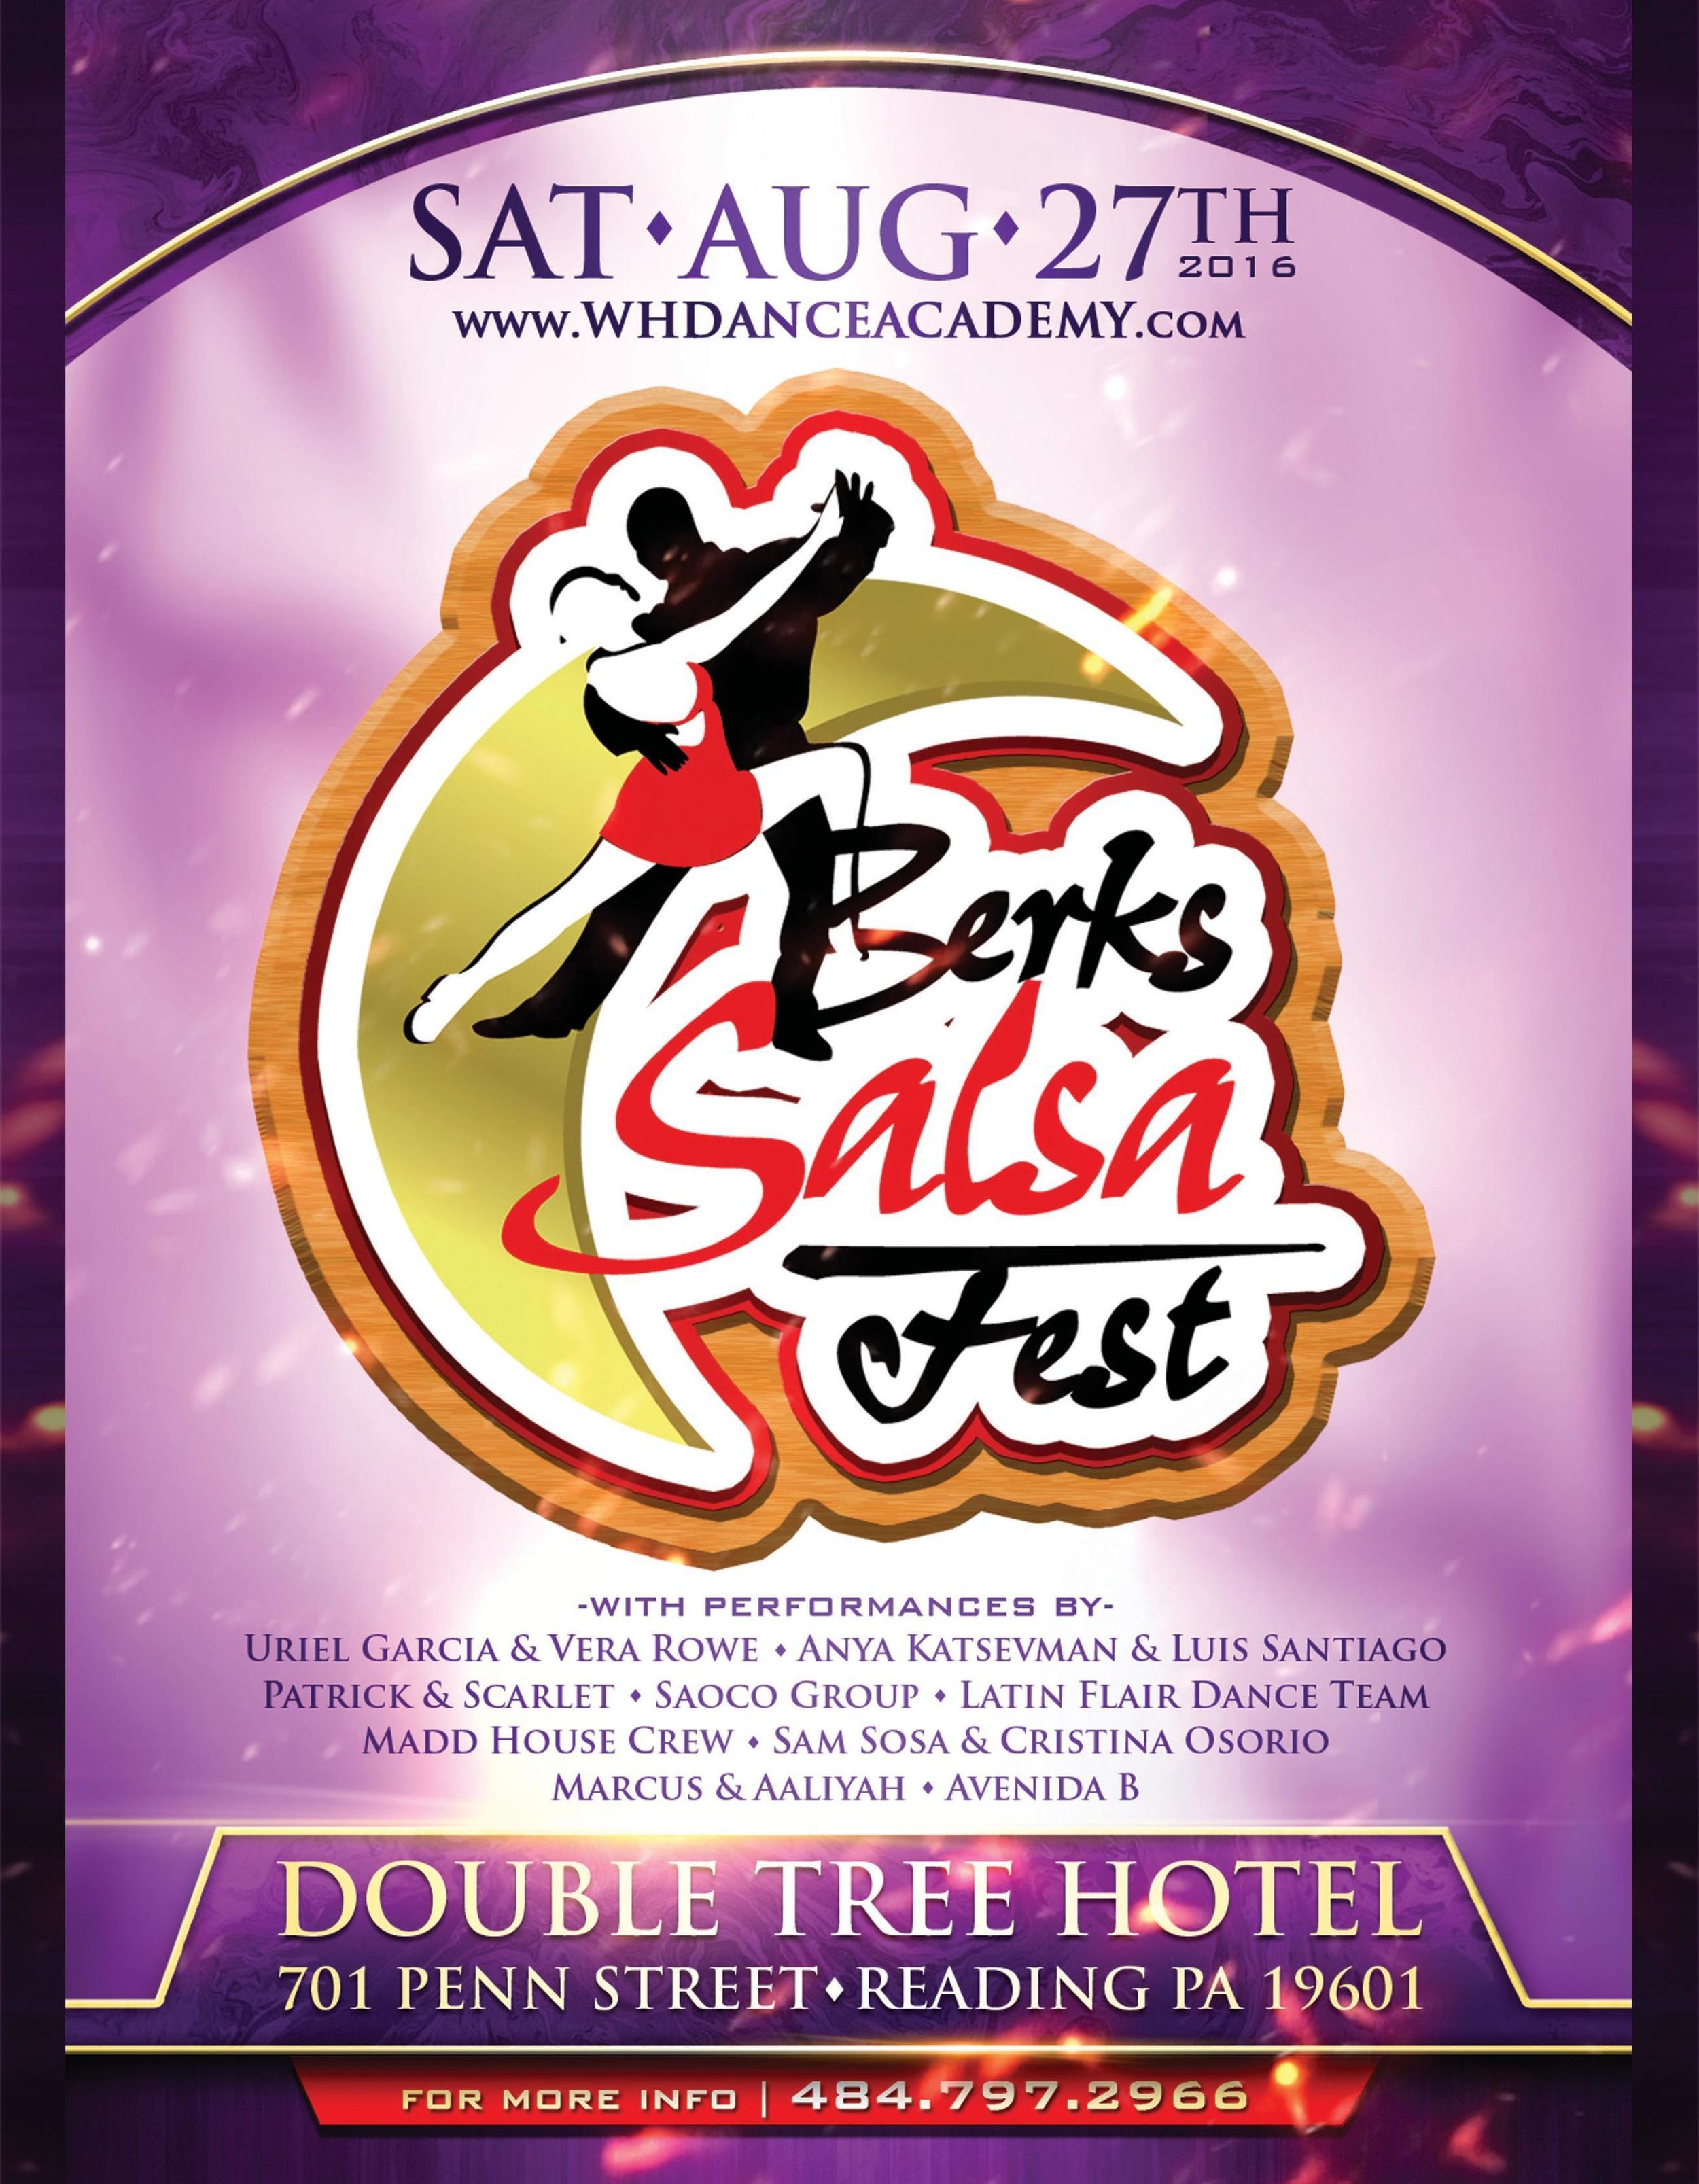 BERKS SALSA FEST 8.75x11.25_FRONT-page-001.jpg